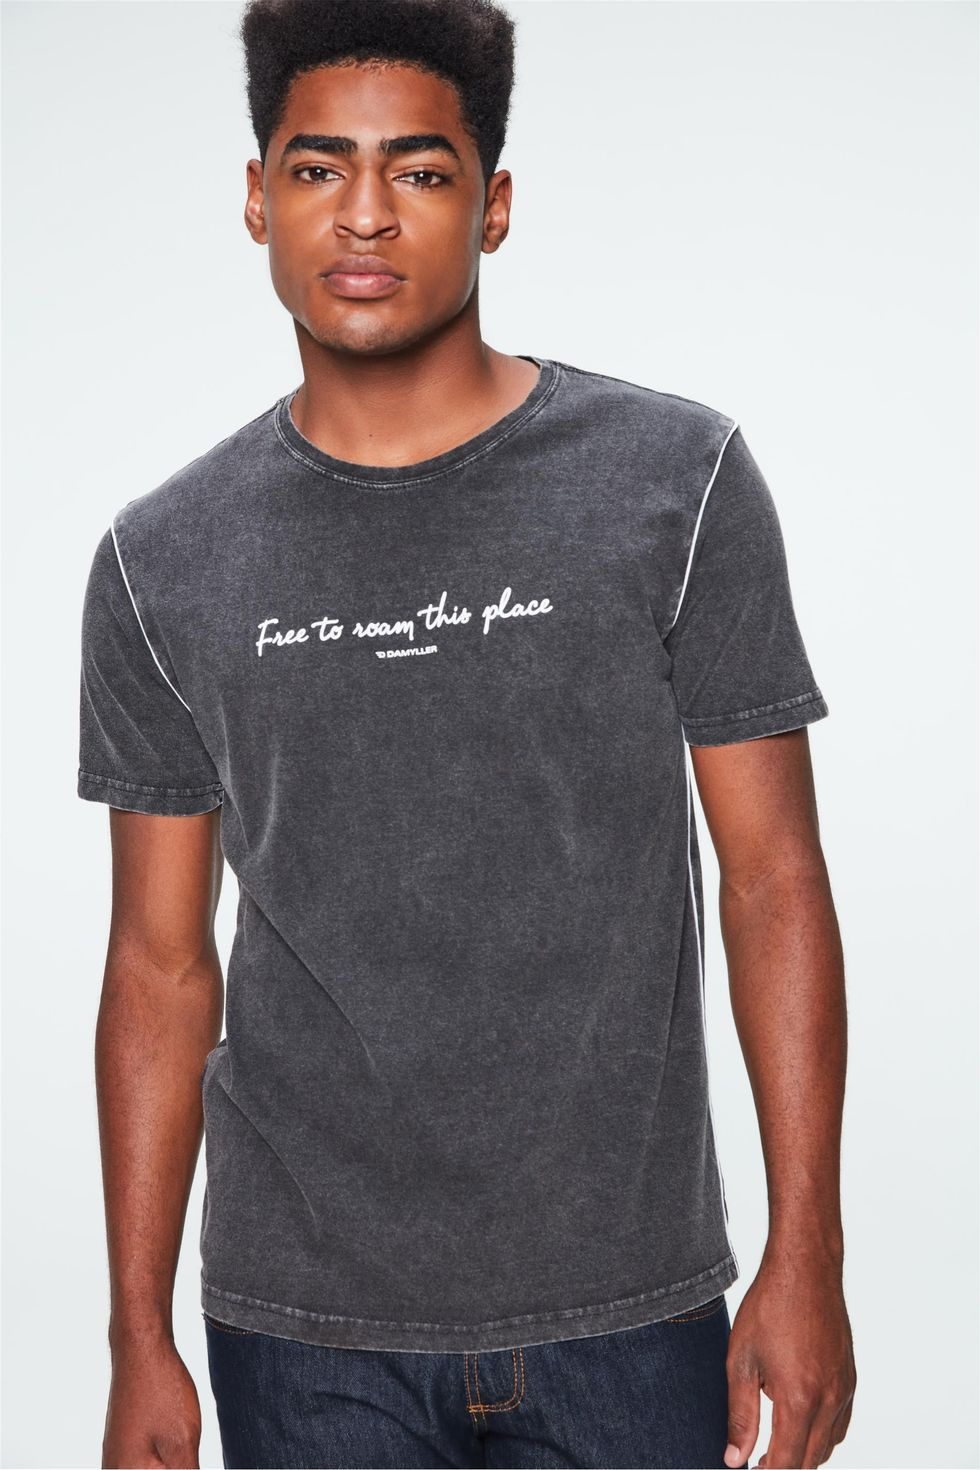 Camiseta-Malha-Denim-Preta-com-Estampa-Frente--